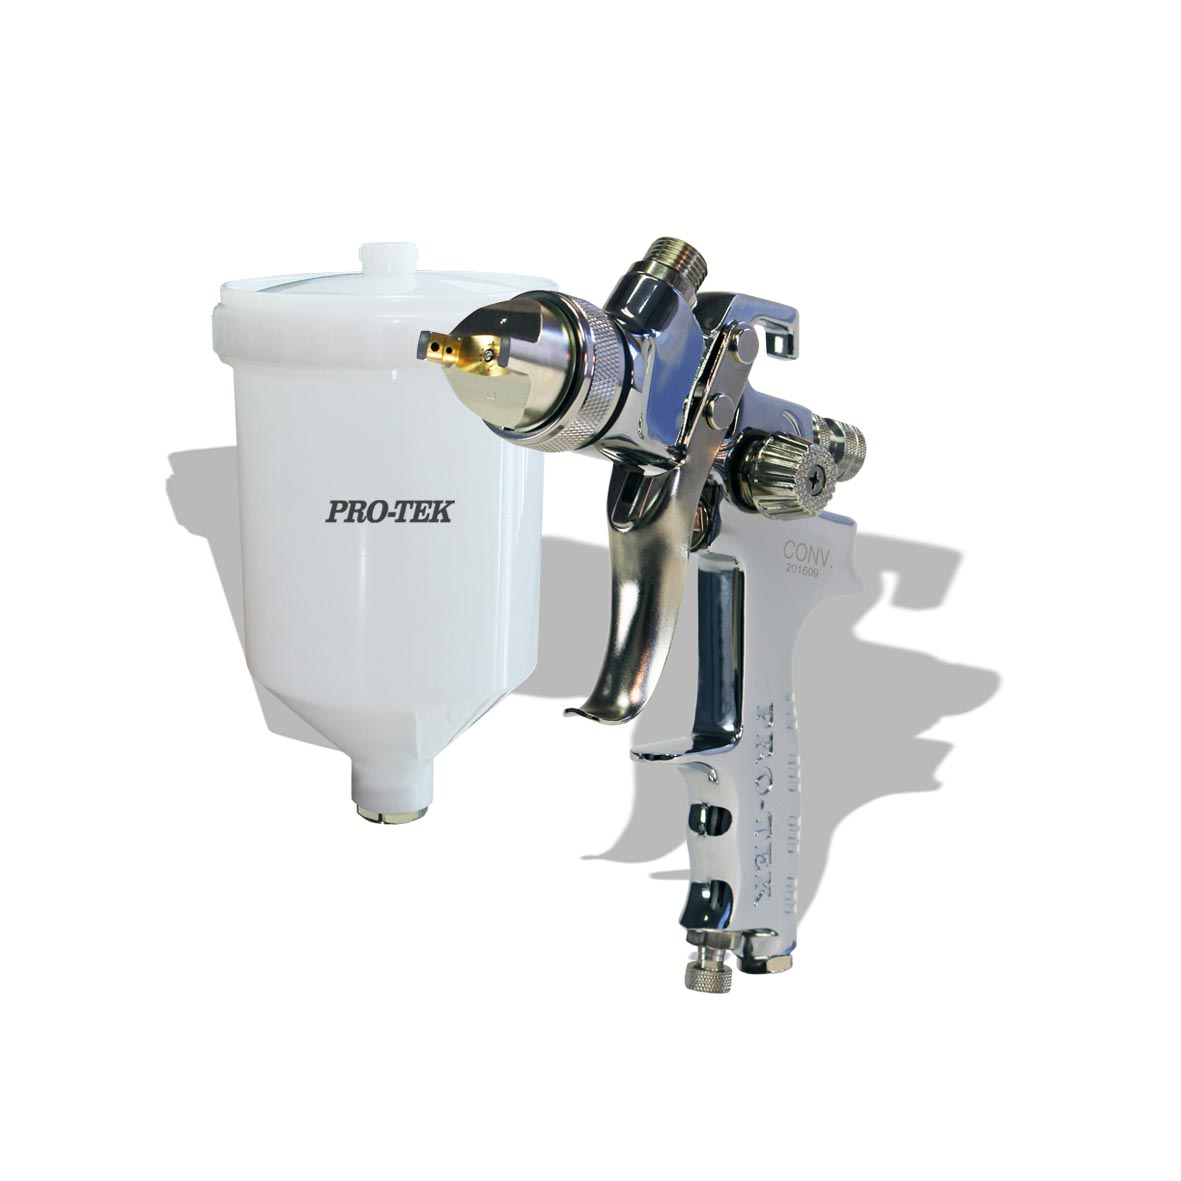 Pro Tek 2600 Gravity Spray Gun Pro Teksprayequipment Com